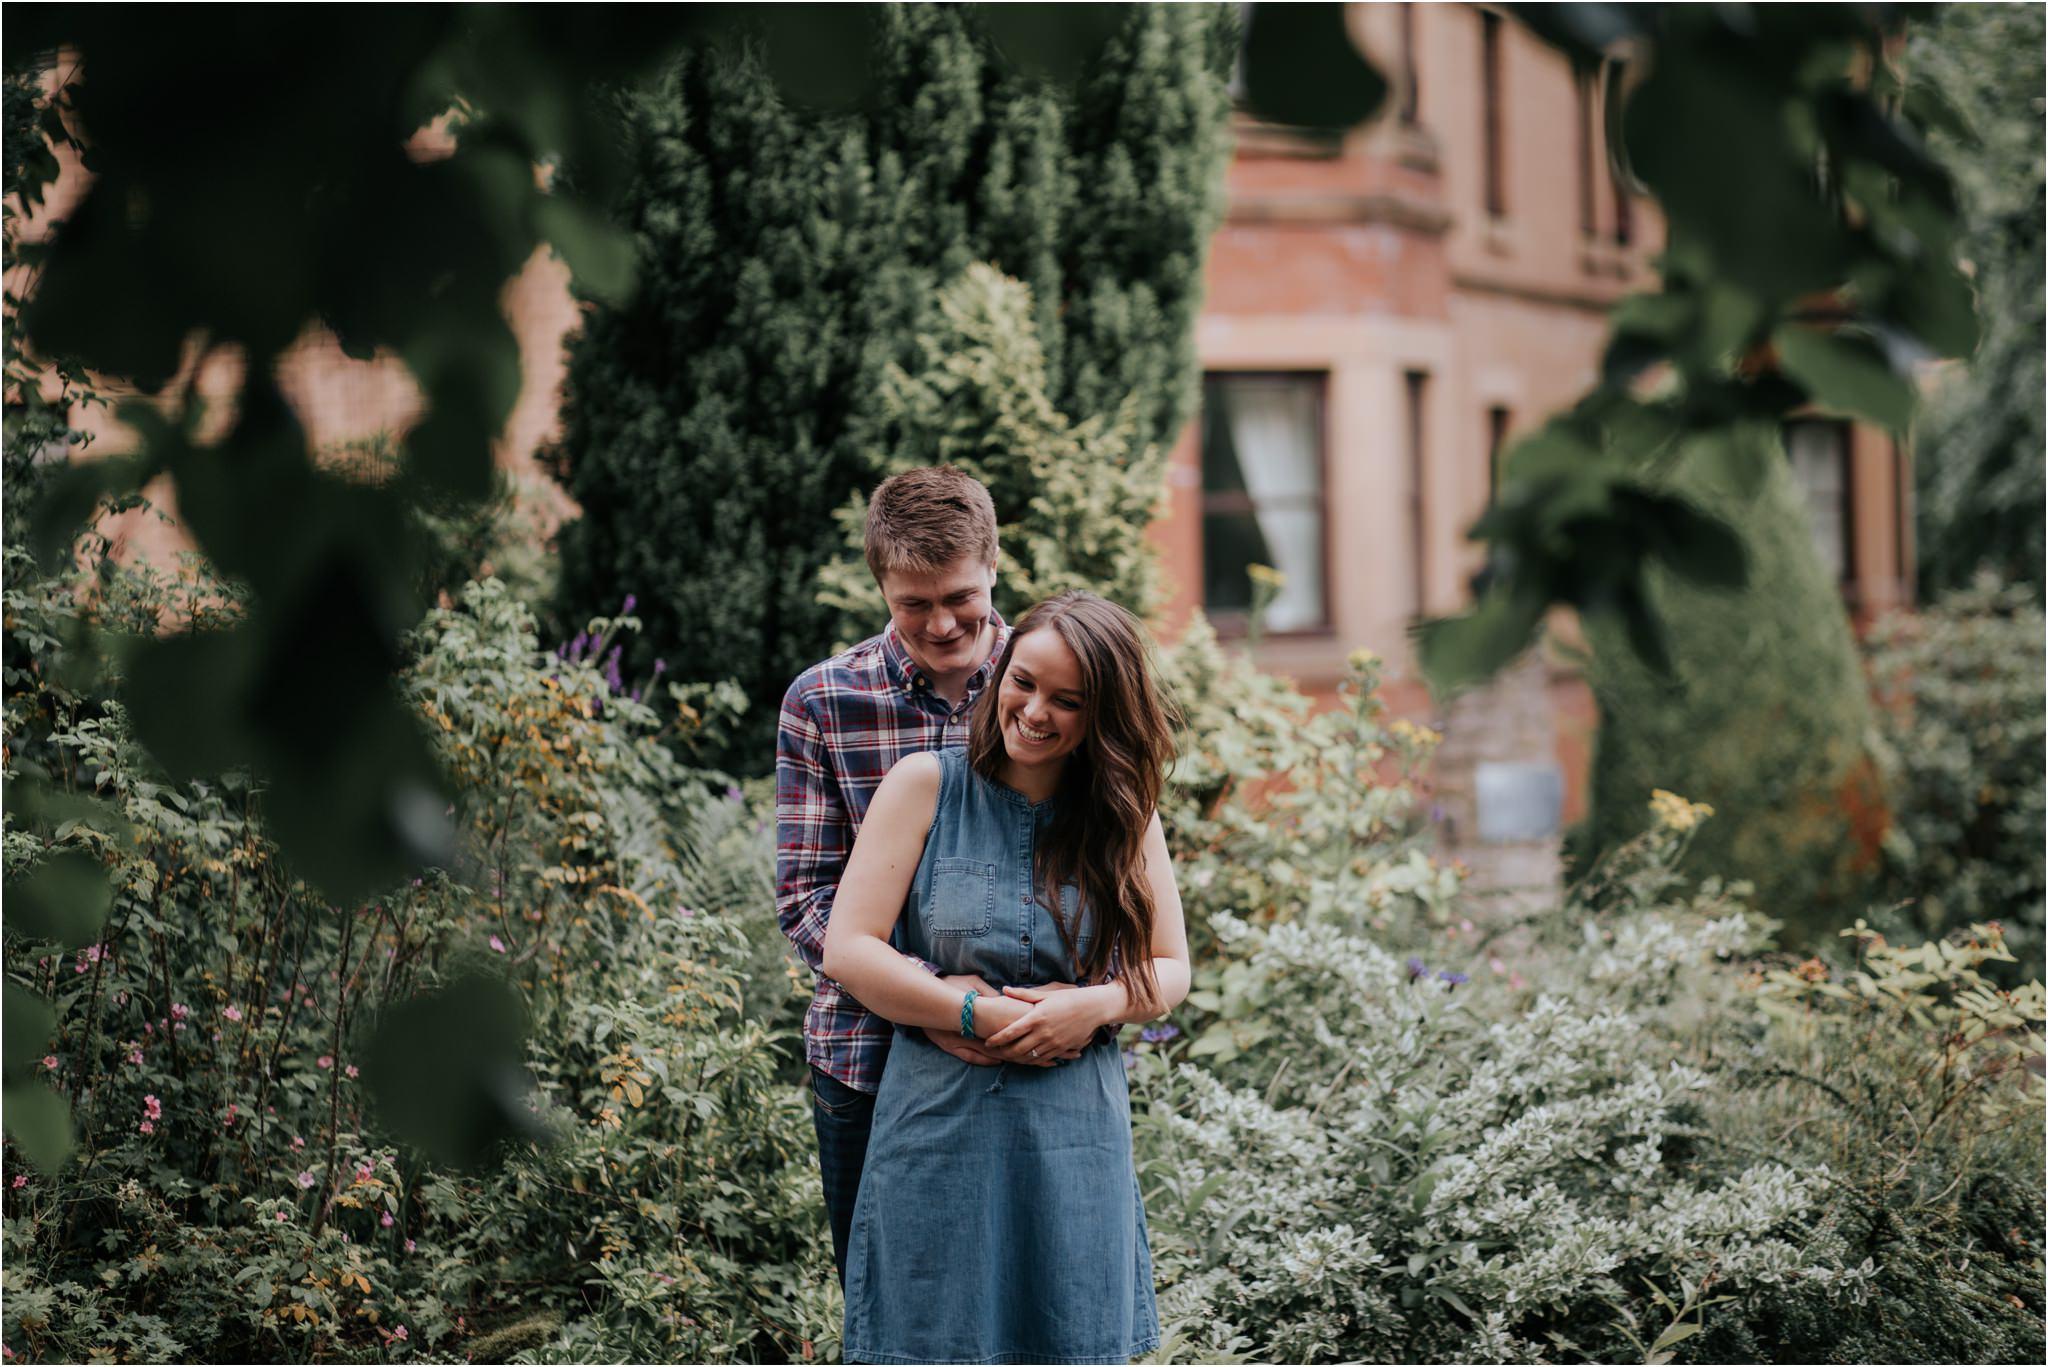 Photography 78 - Glasgow Wedding Photographer - Corrie Jonathan Glasgow West End_0003.jpg